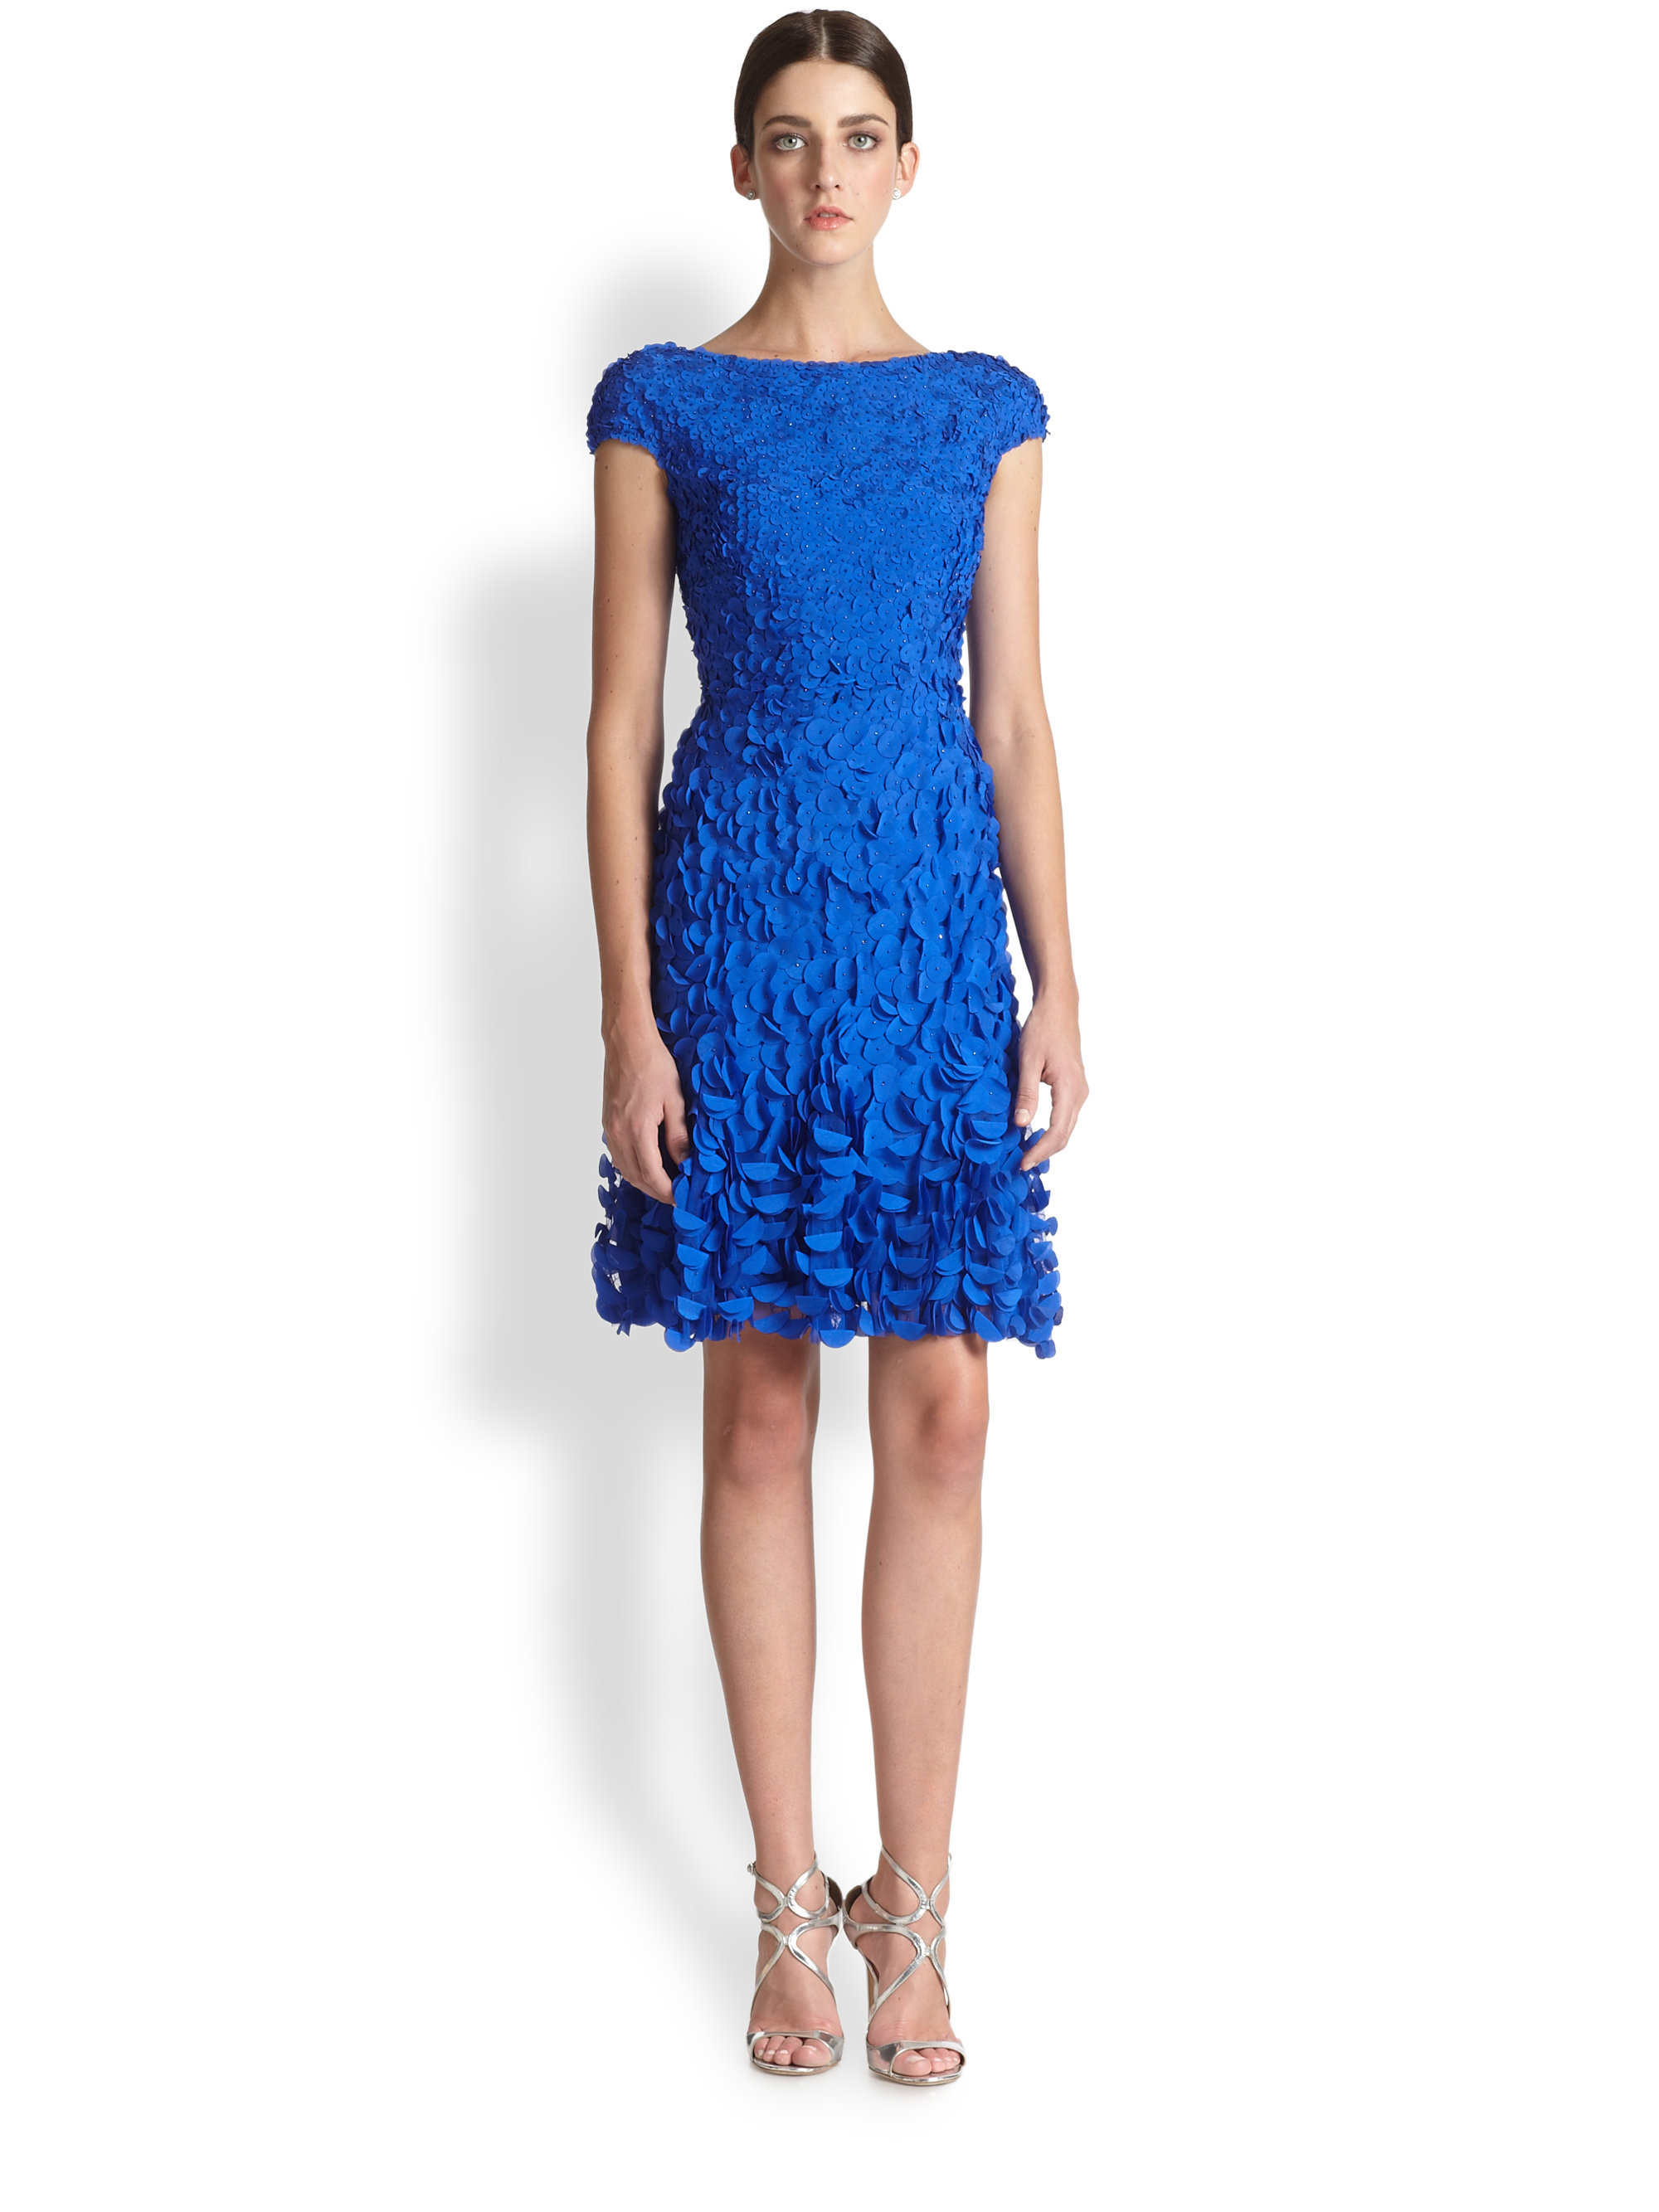 Lyst - Theia Boatneck Petal Dress in Blue